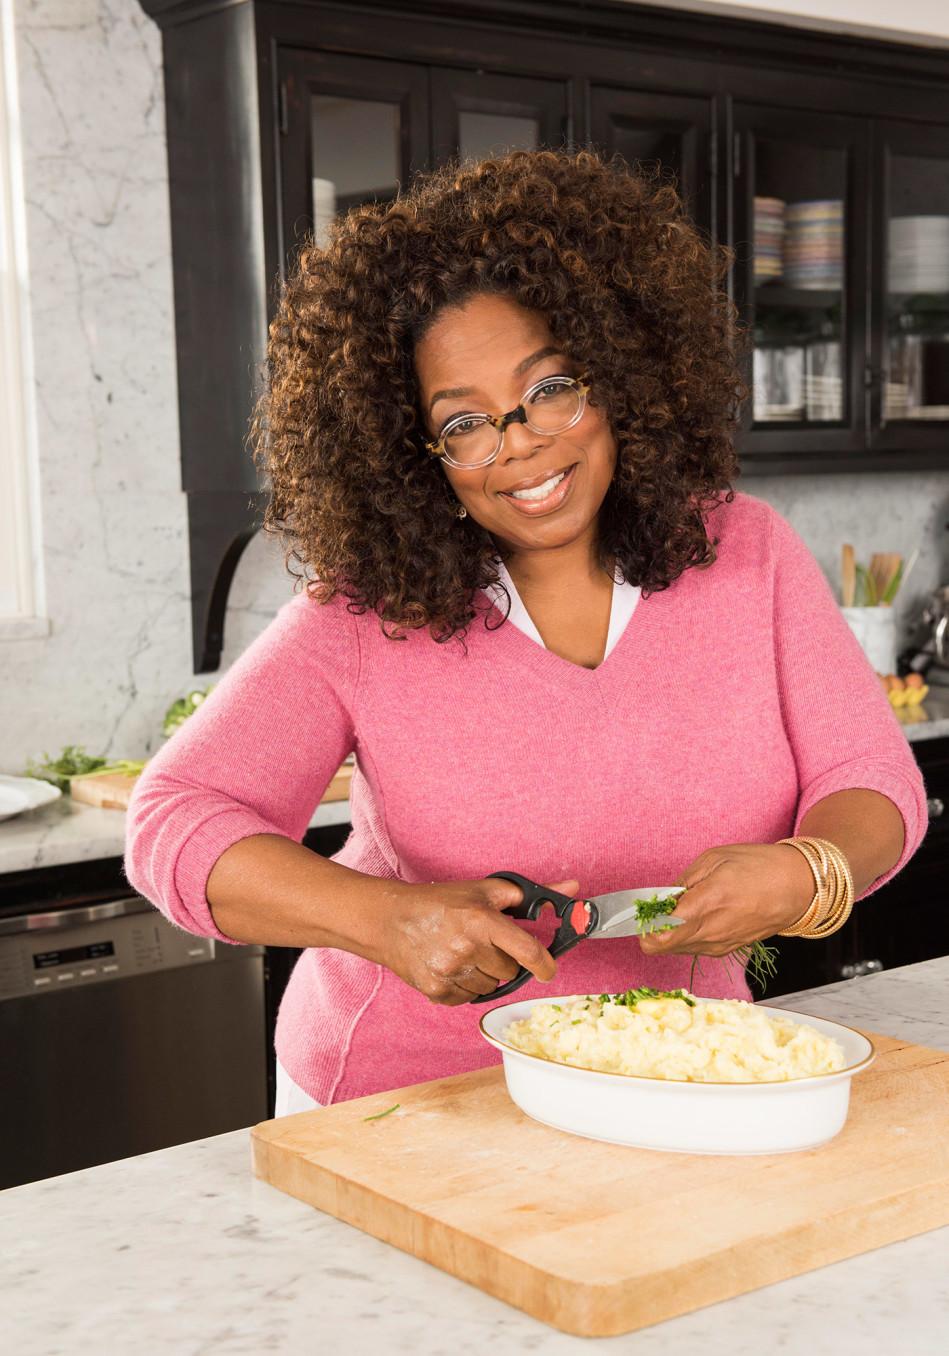 oprah caulipotatoes